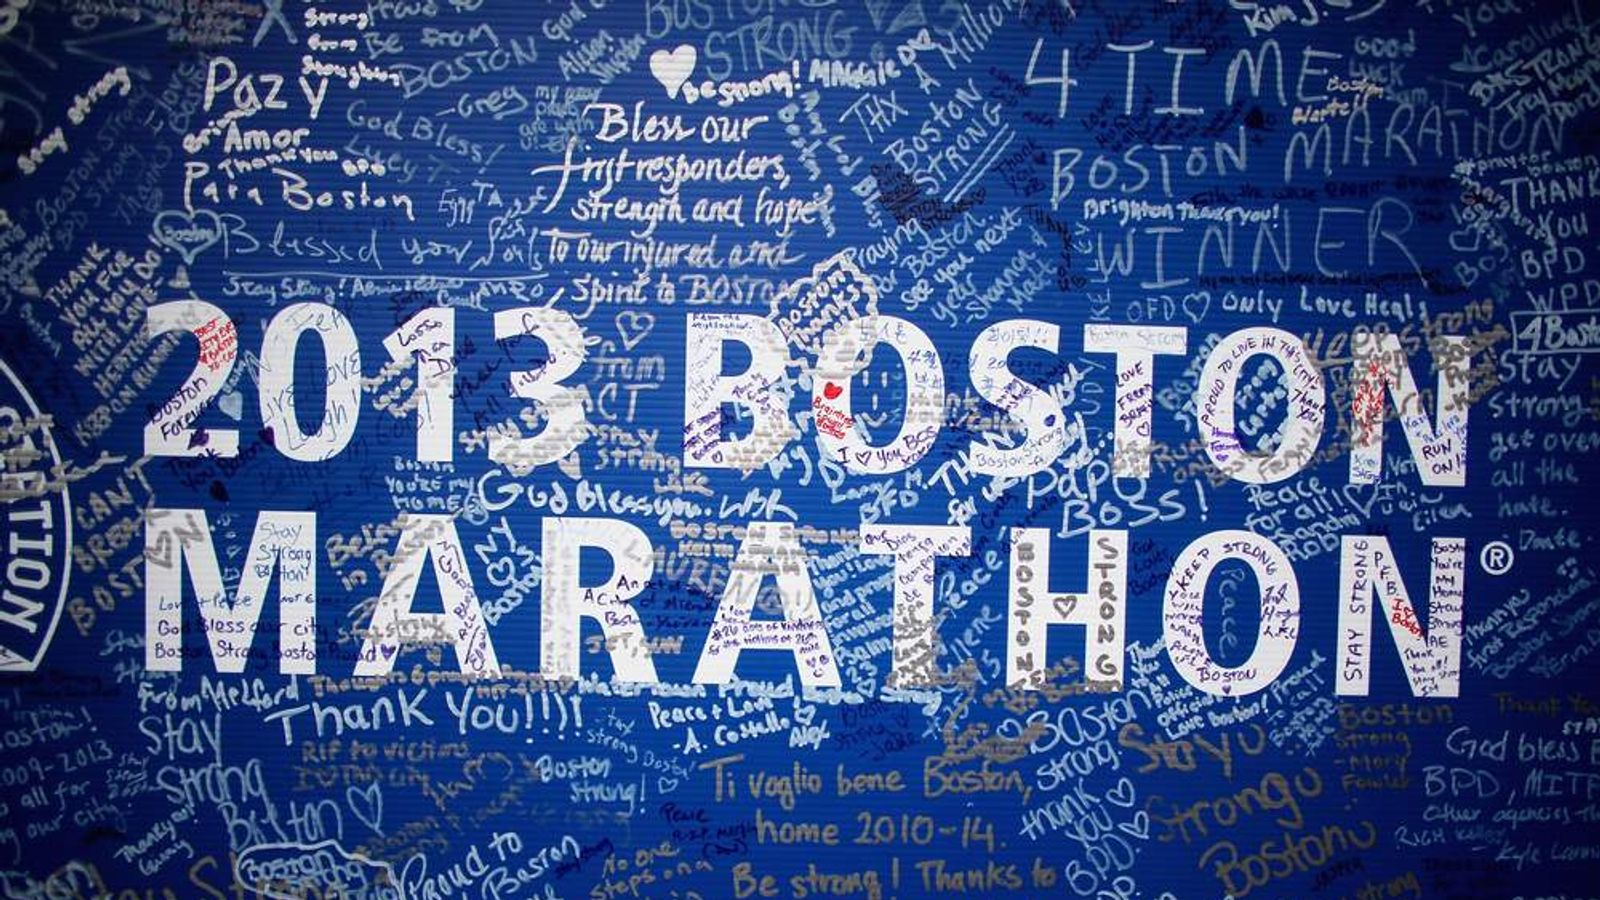 Signatures adorn a Boston Marathon poster near the site of the Boston Marathon bombings